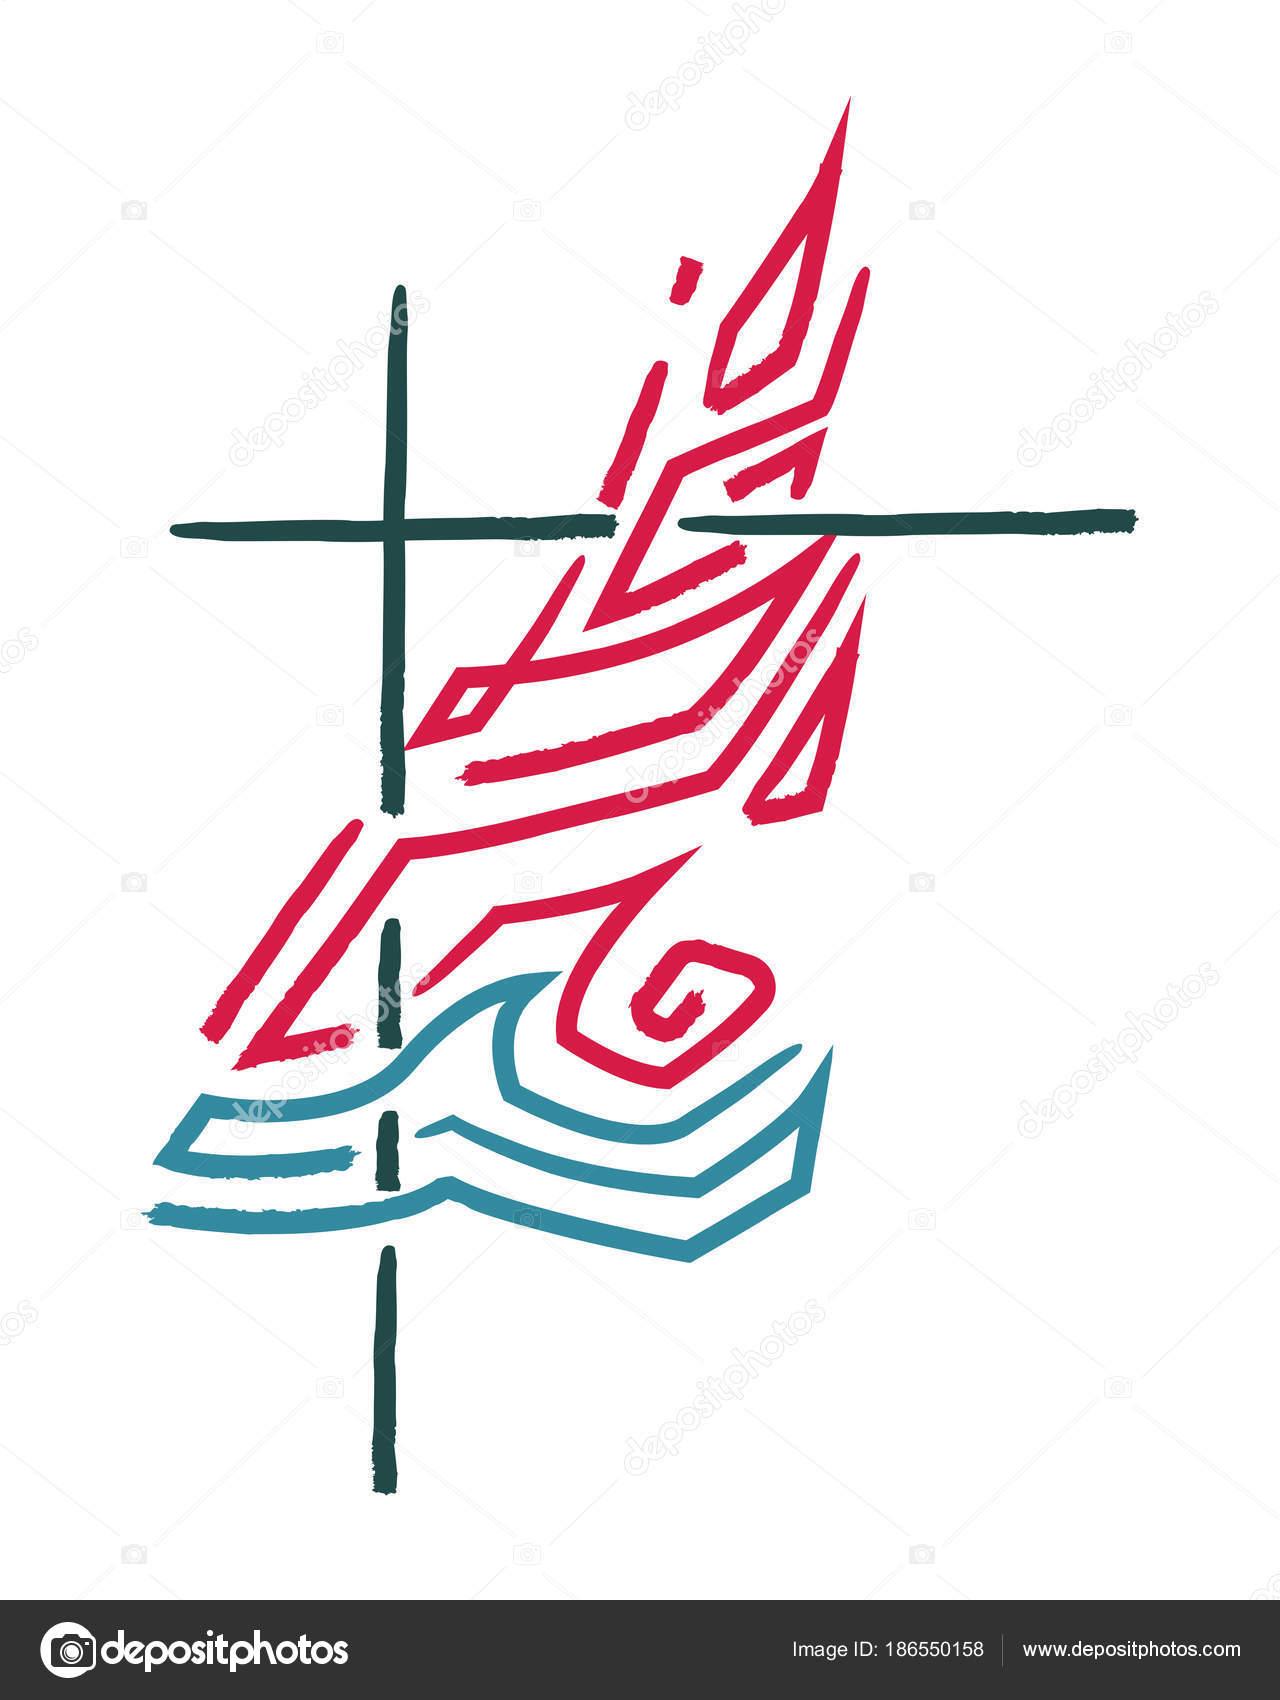 Hand drawn vector illustration religious cross fire water symbol hand drawn vector illustration of religious cross fire and water symbol vector by bernardojbp biocorpaavc Choice Image